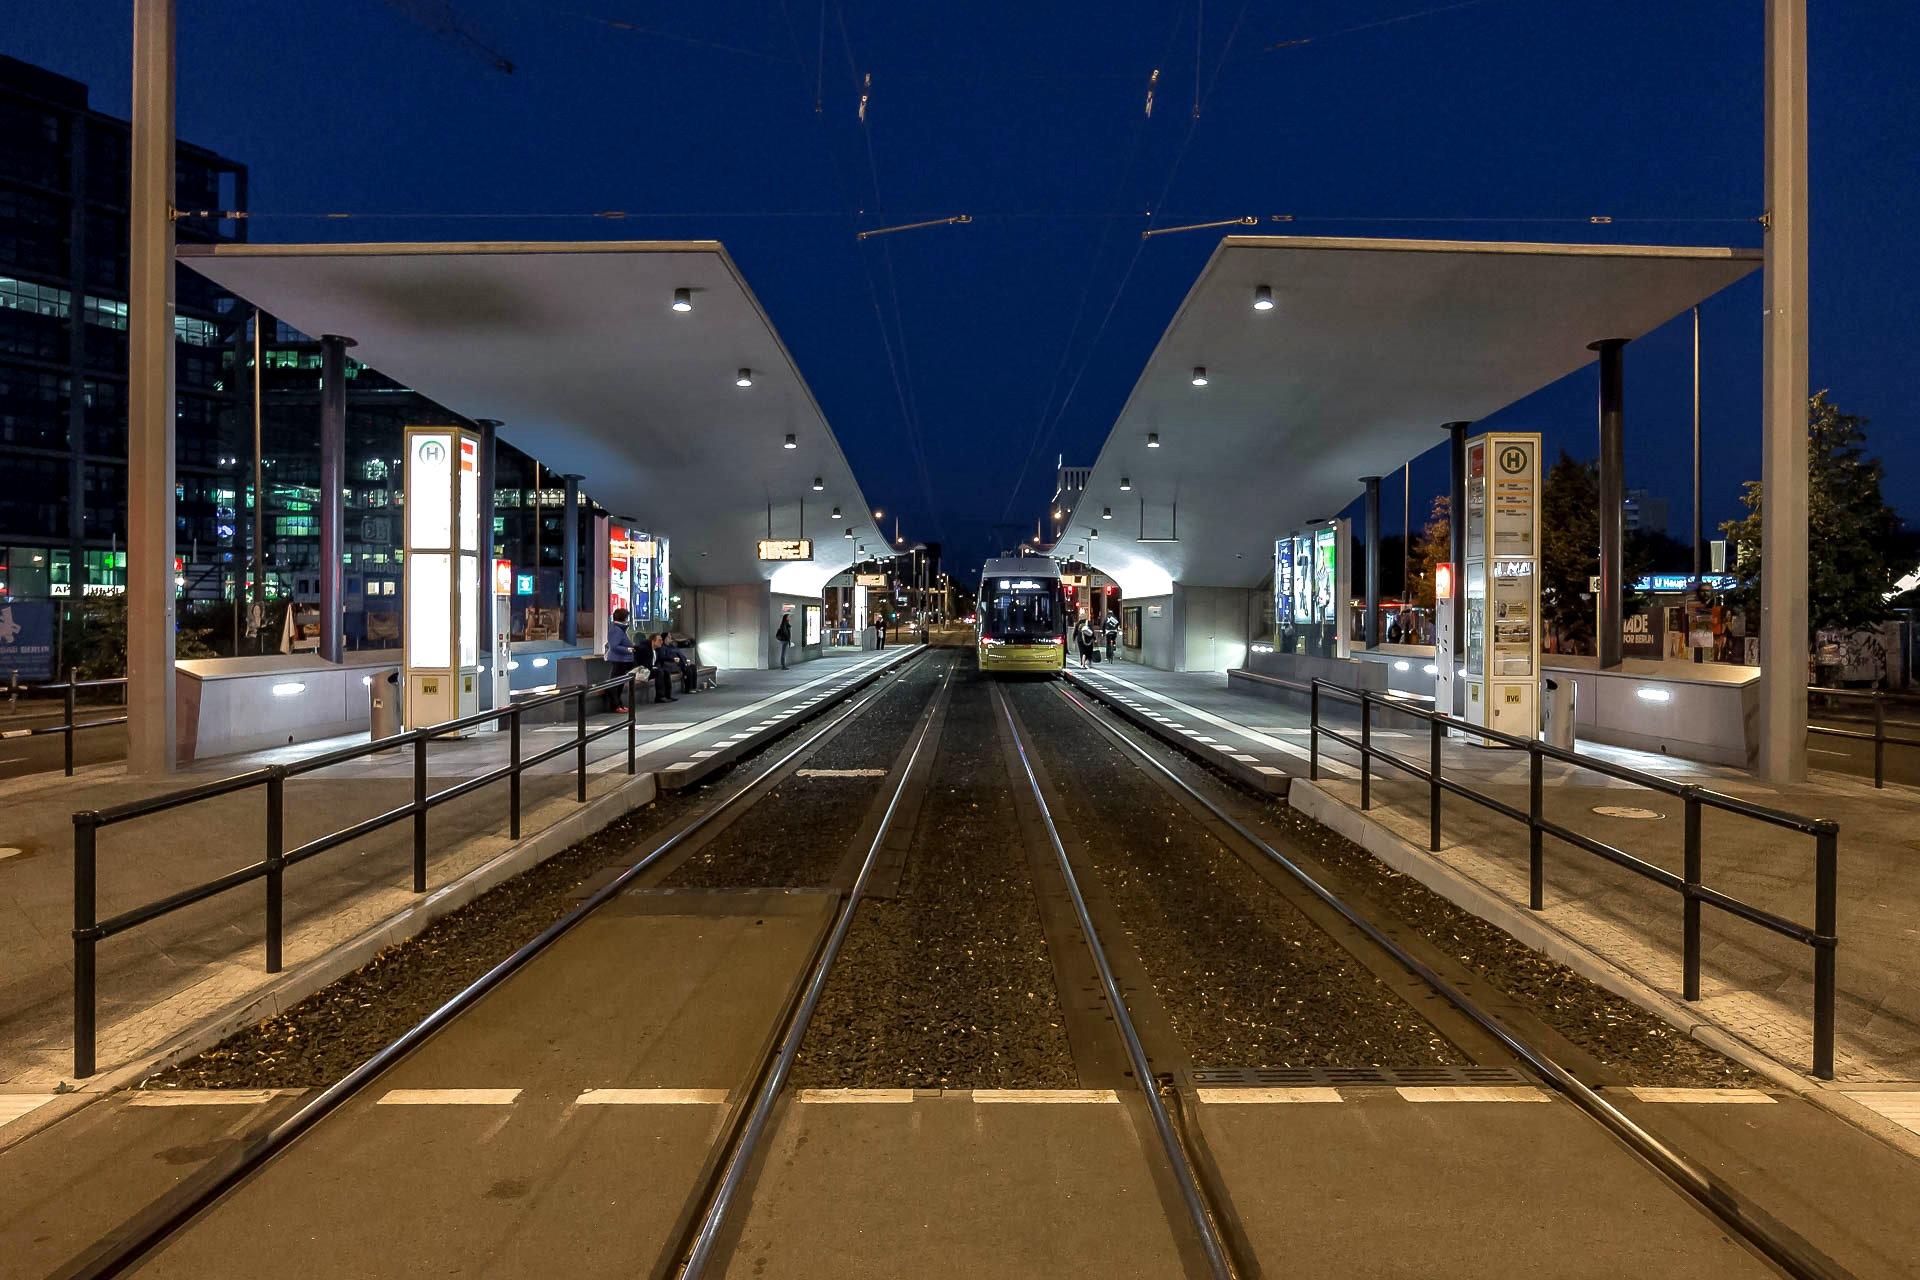 Strassenbahn by JeckstadtPhotography